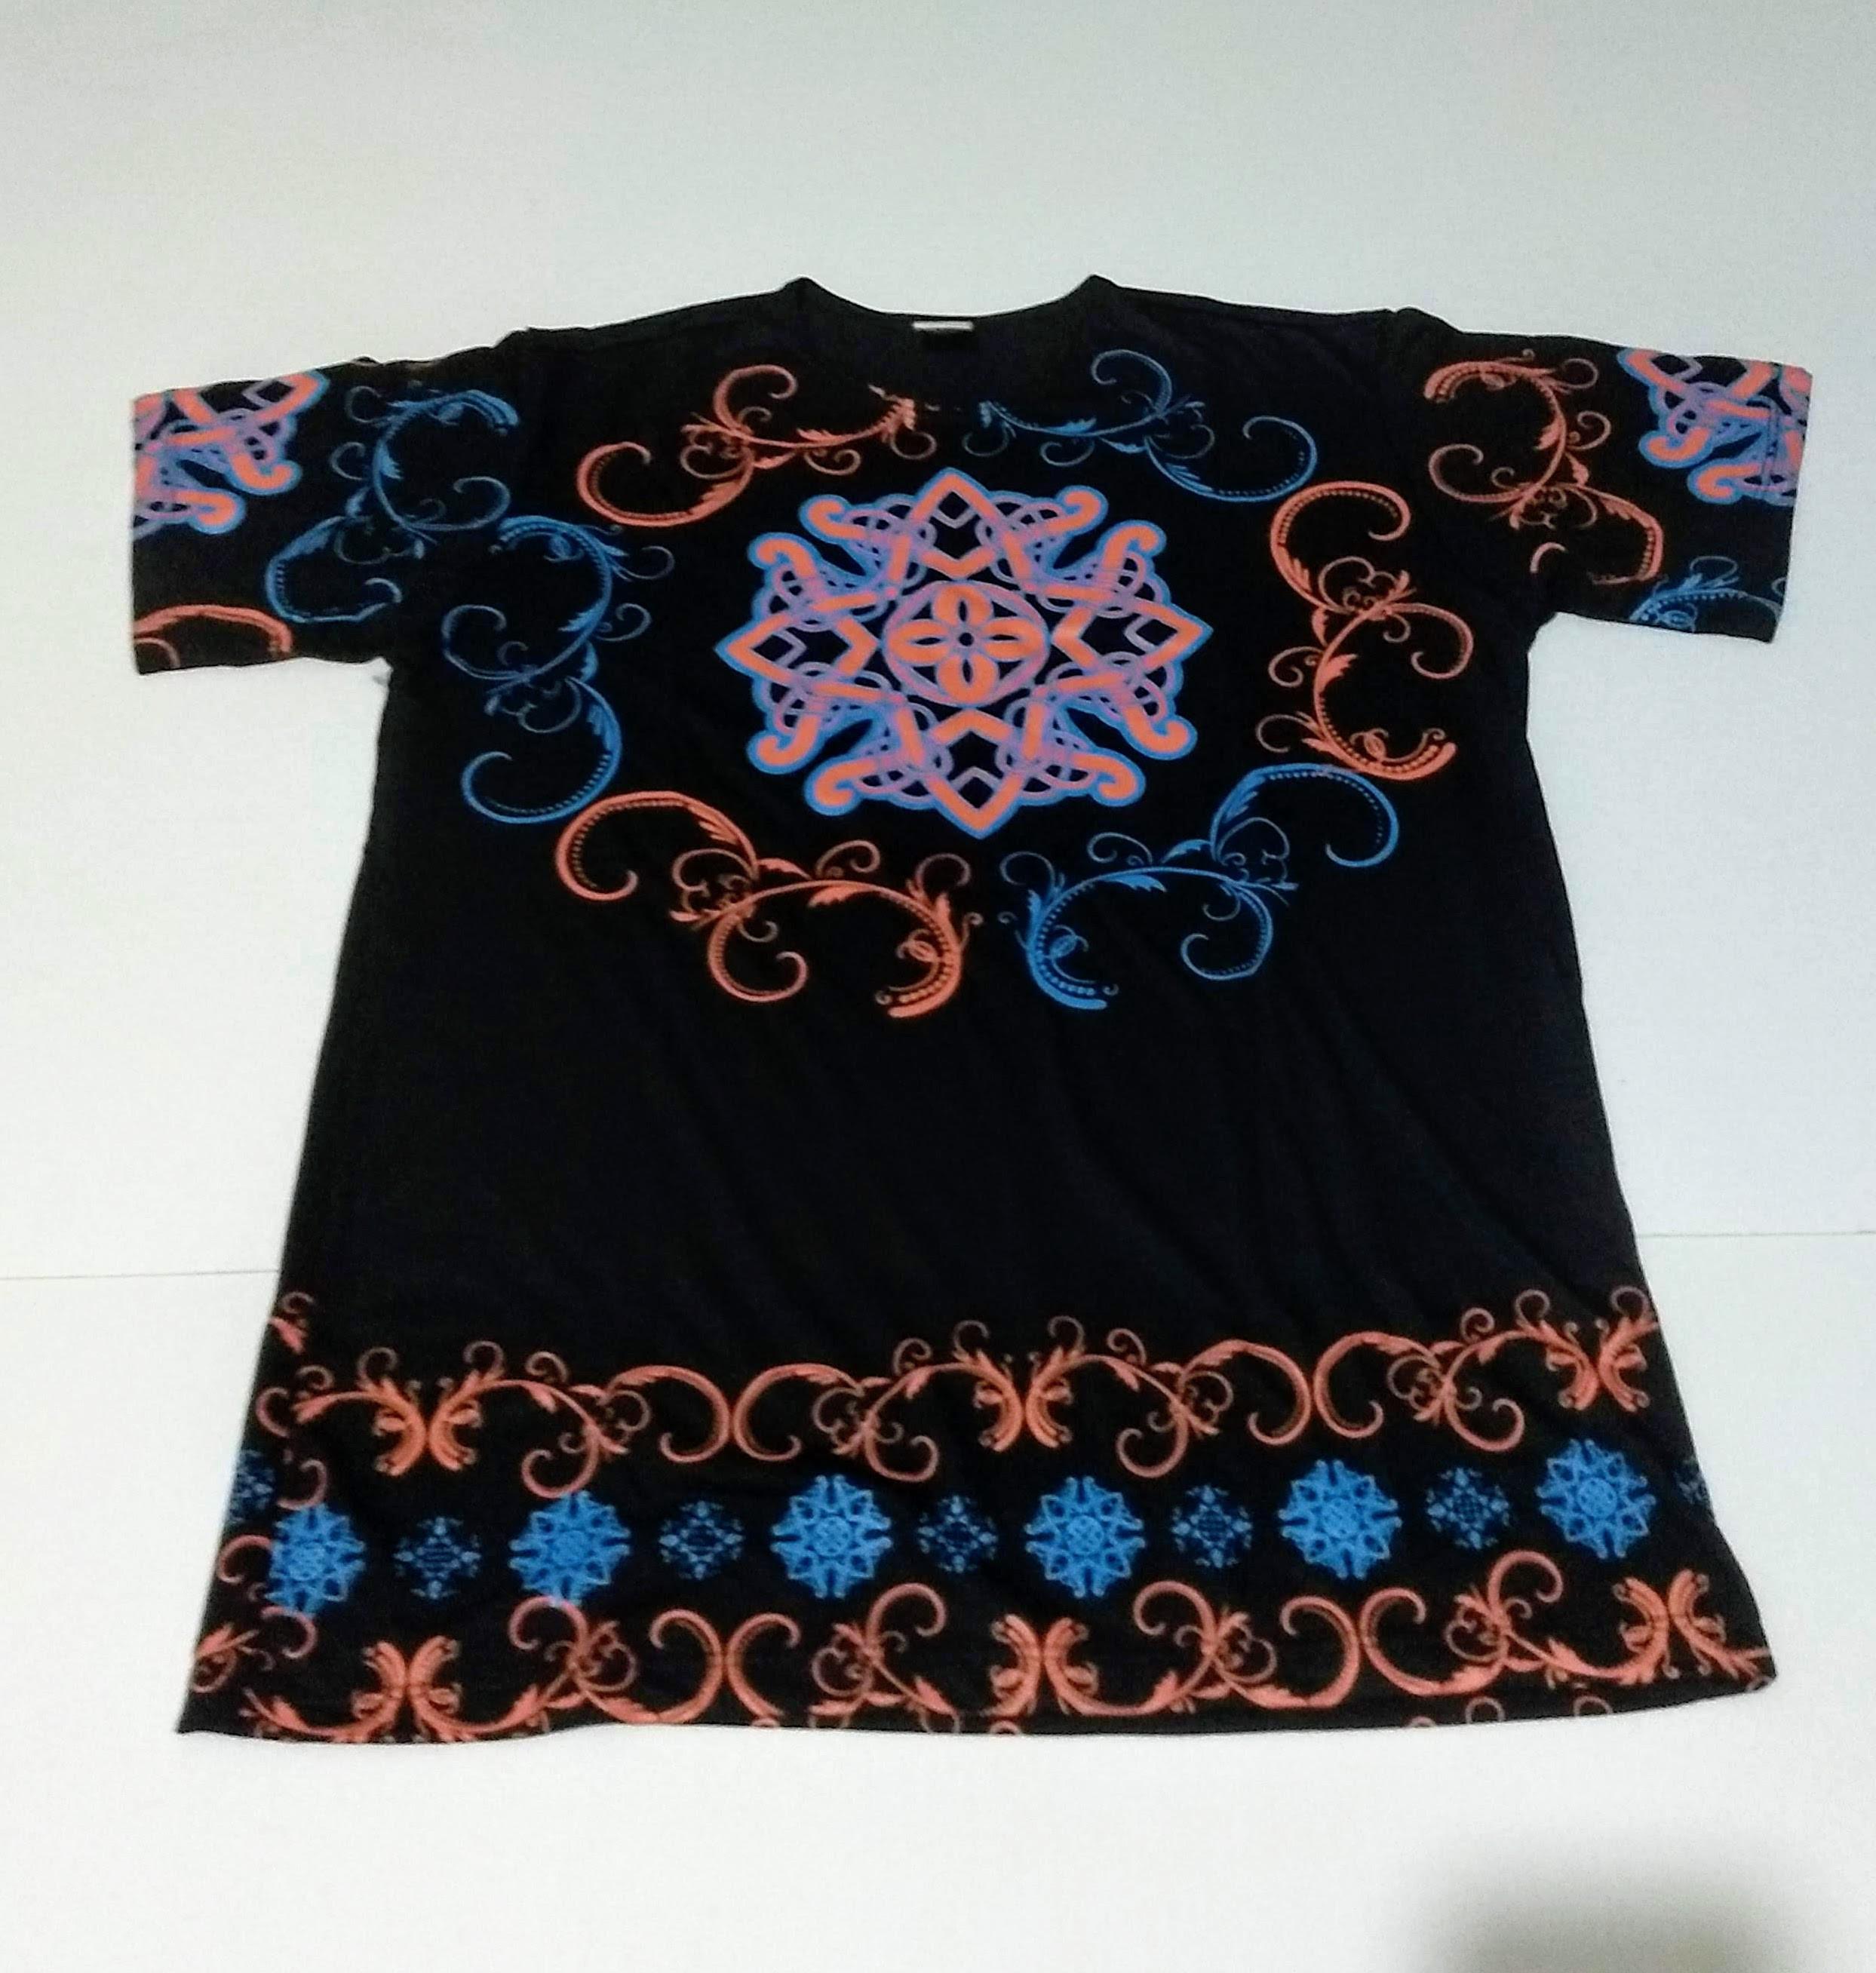 JA036 - Camiseta Preta (Estrela de Belém)